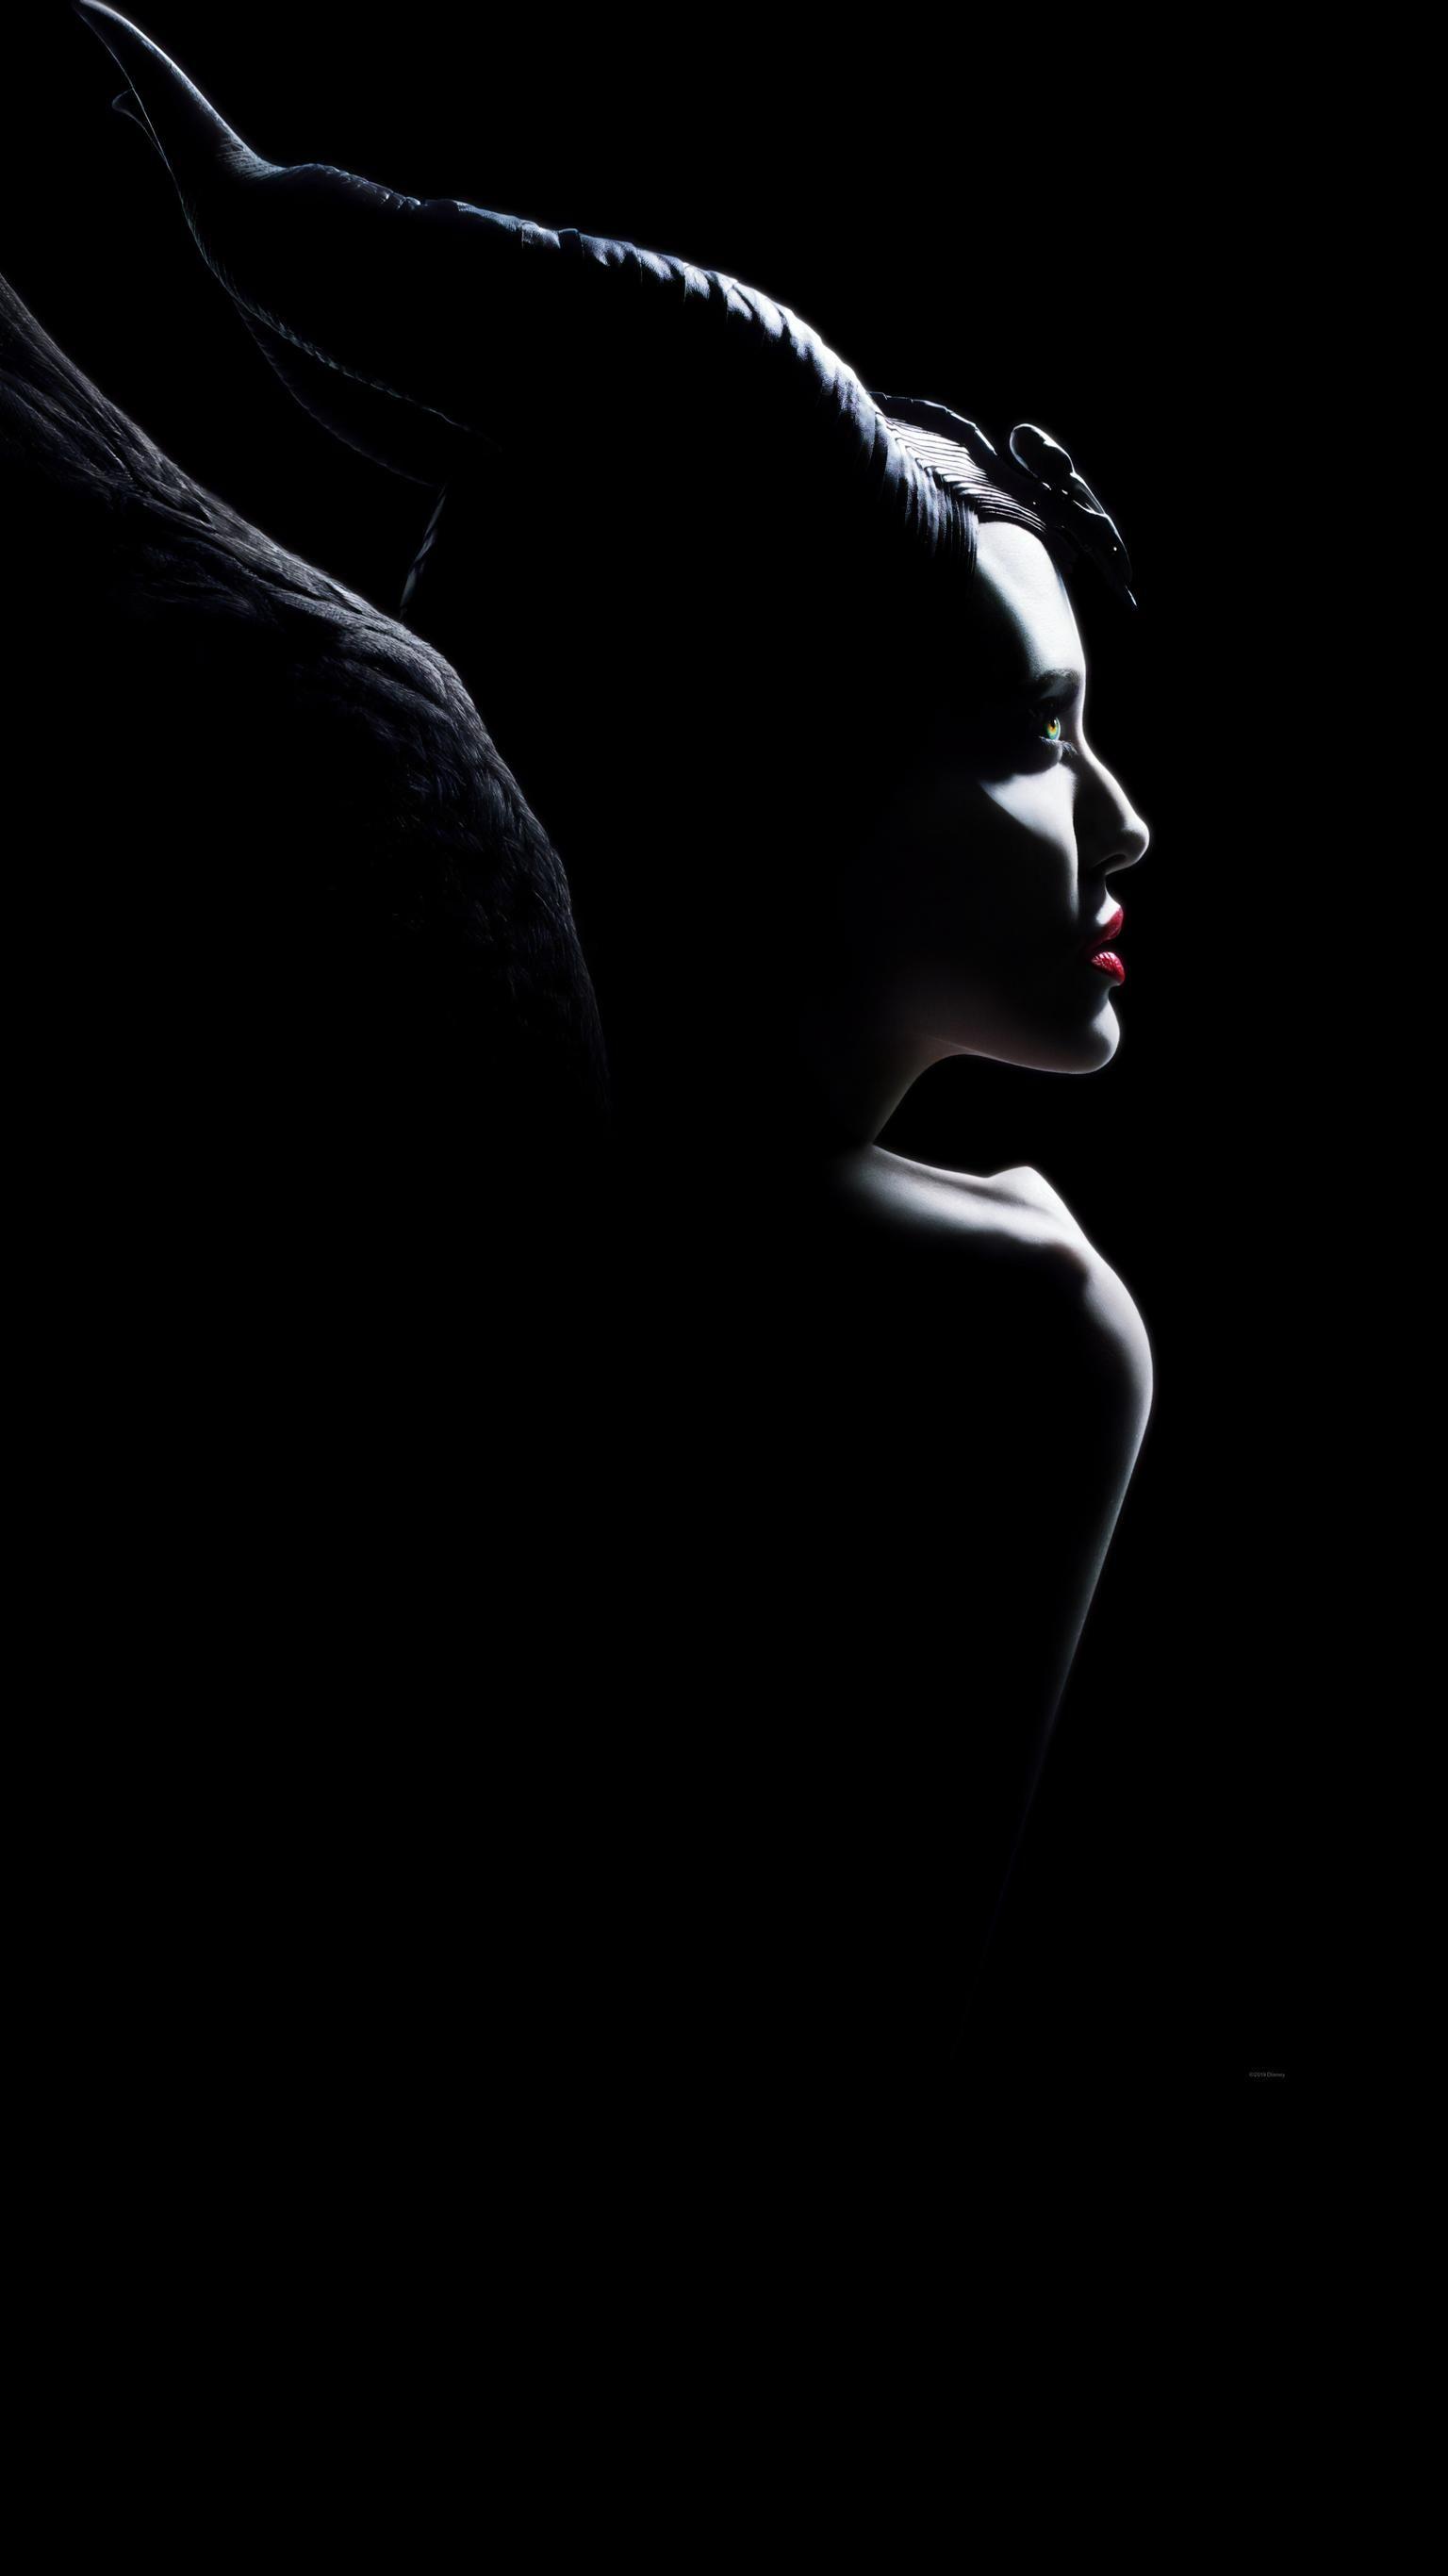 Maleficent Mistress Of Evil 2019 Phone Wallpaper Moviemania Maleficent Movie Angelina Jolie Maleficent Maleficent